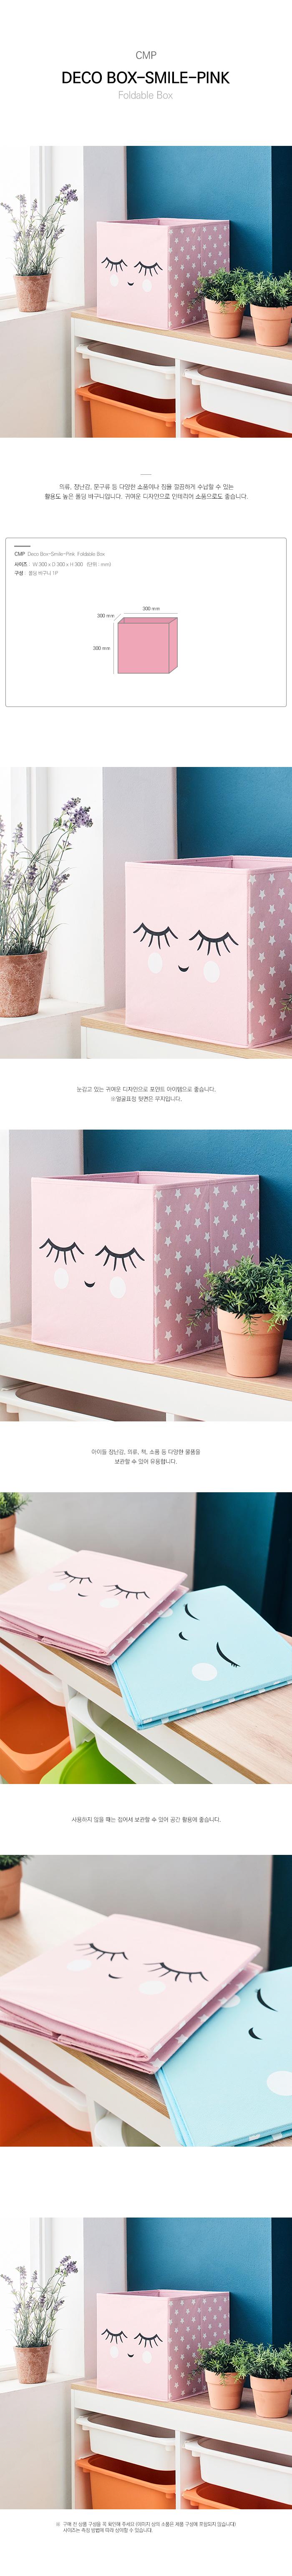 Deco-Box-Smile-Pink_180427.jpg